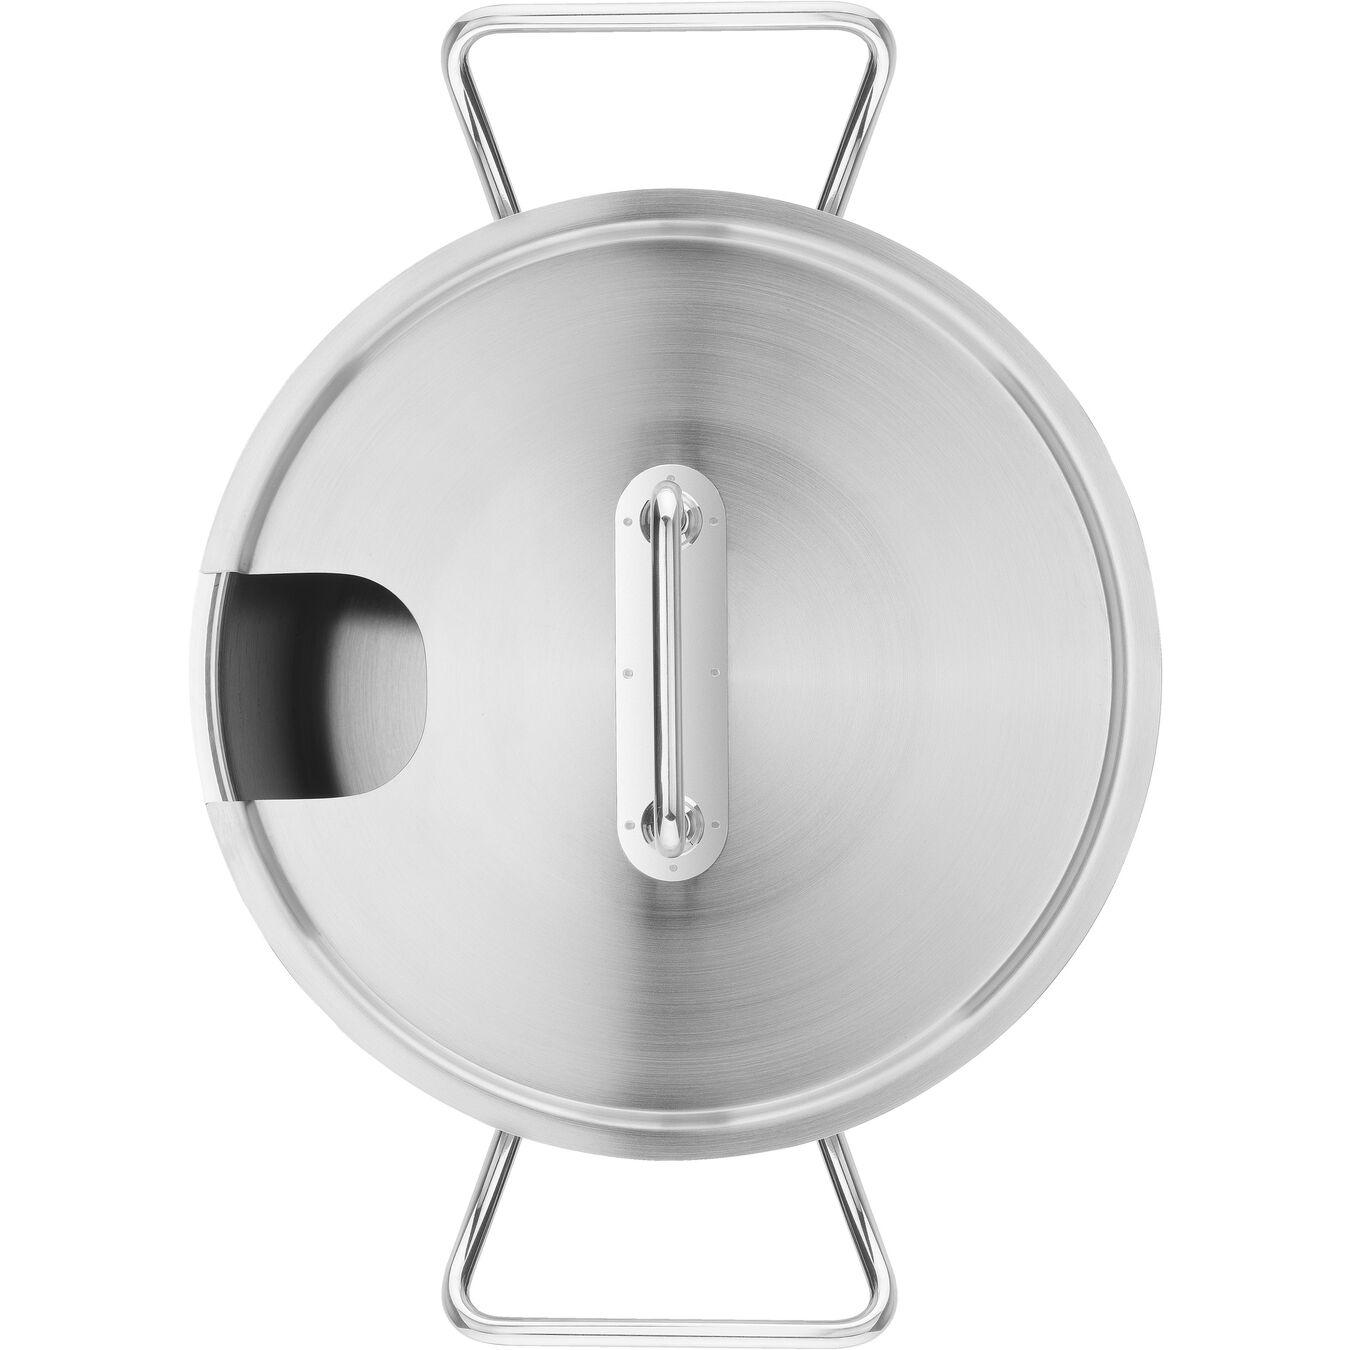 coperchio per cottura a bassa temperatura 24 cm, 18/10 acciaio inossidabile,,large 4